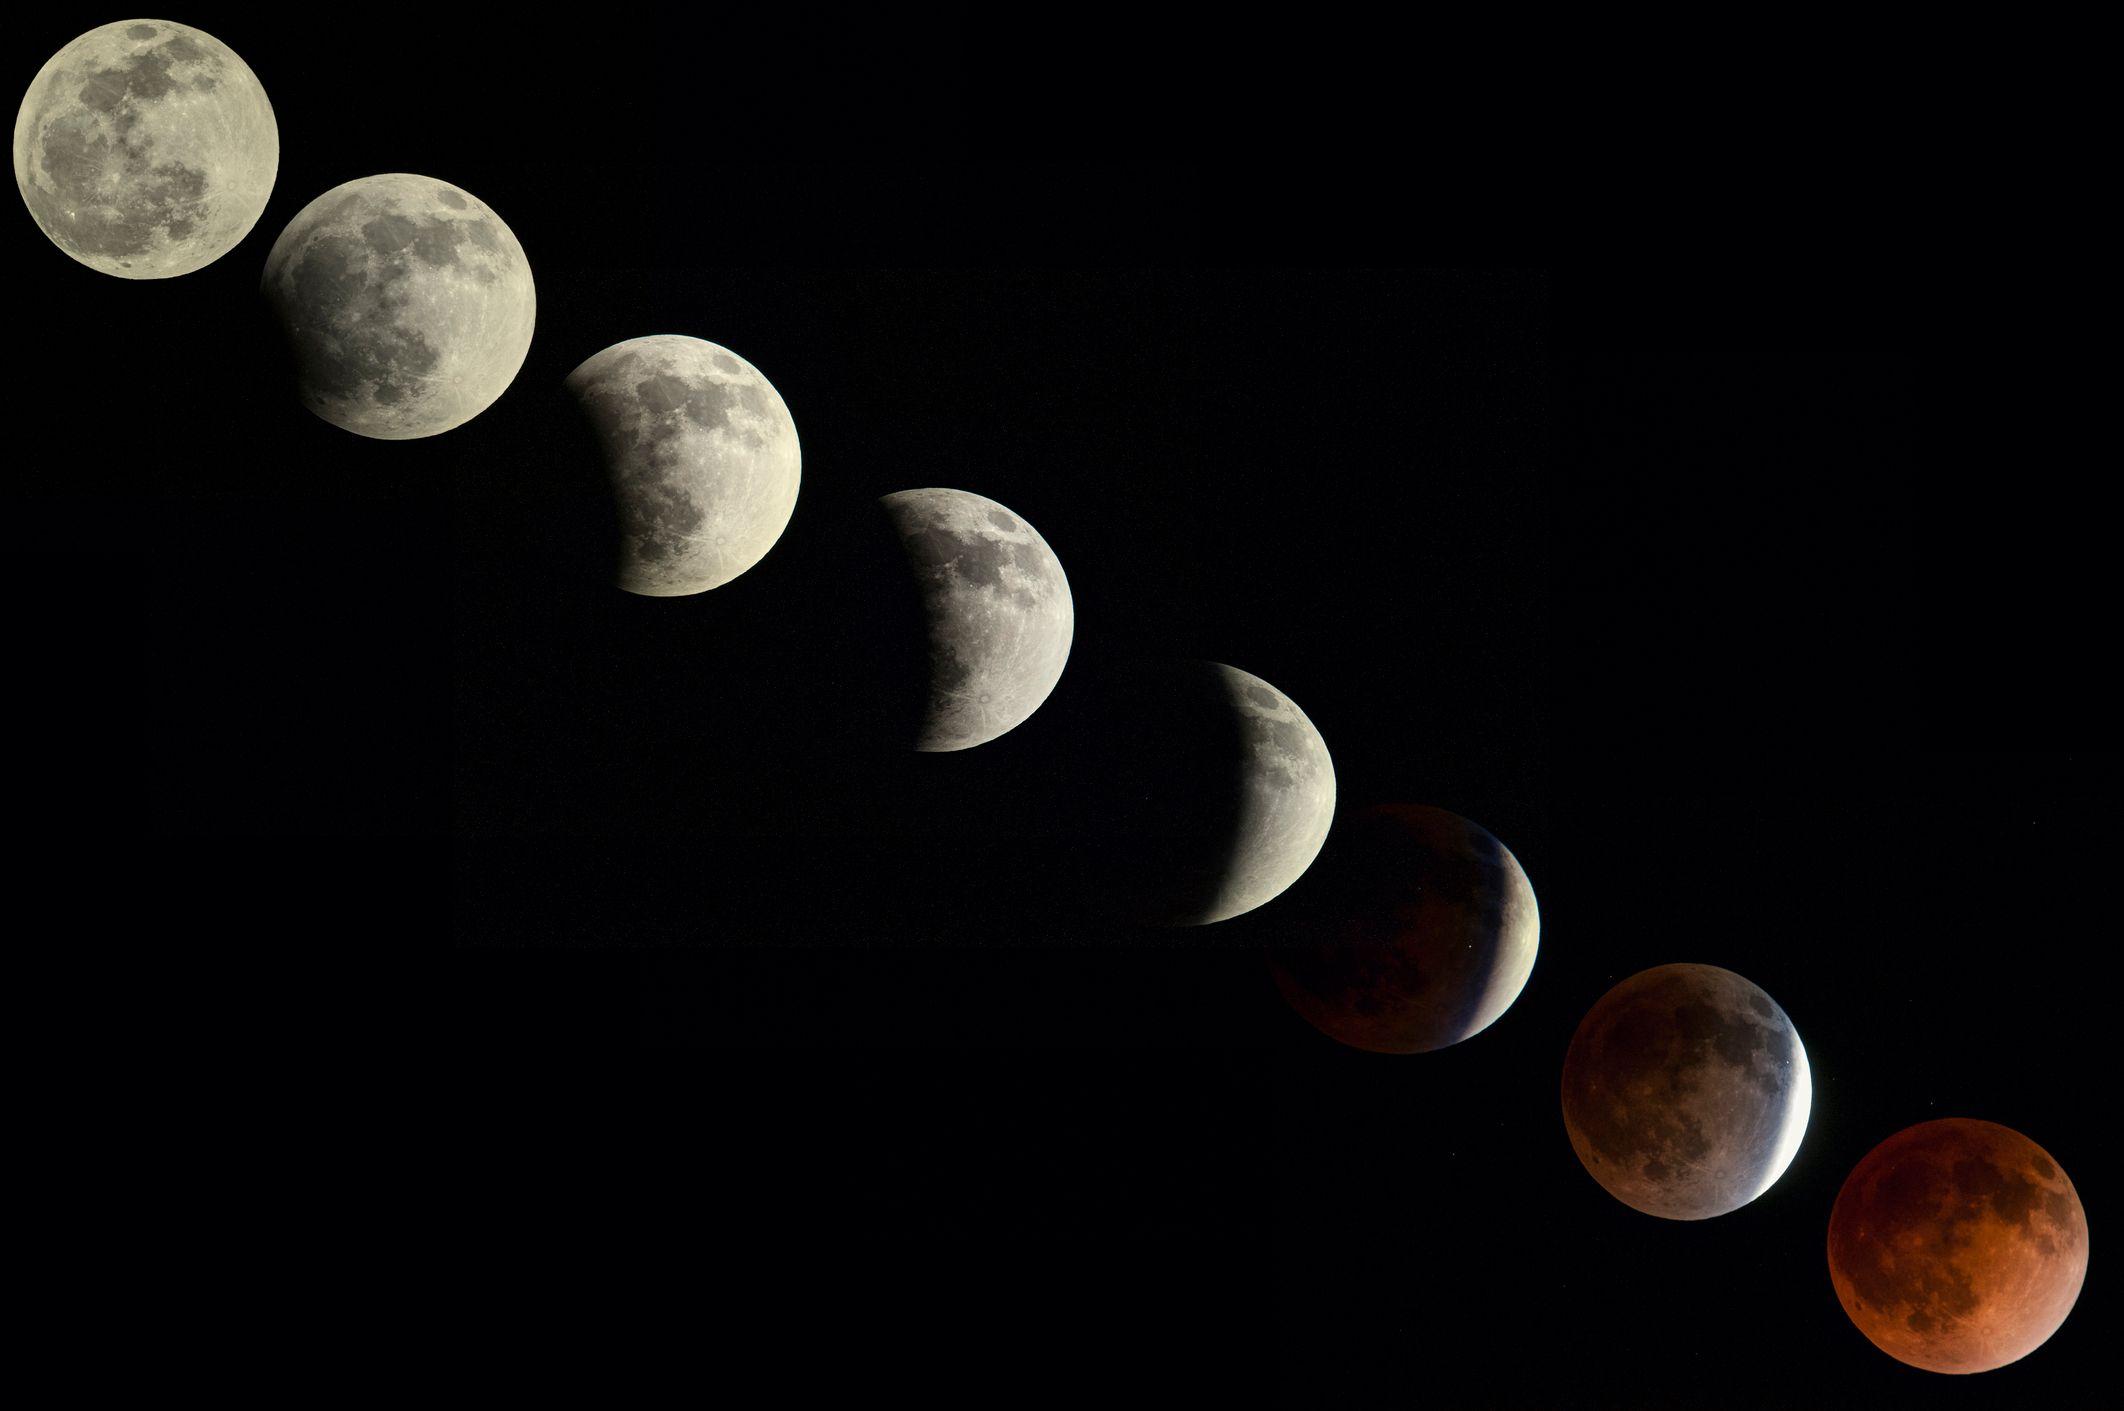 9 march 2020 lunar eclipse horoscope